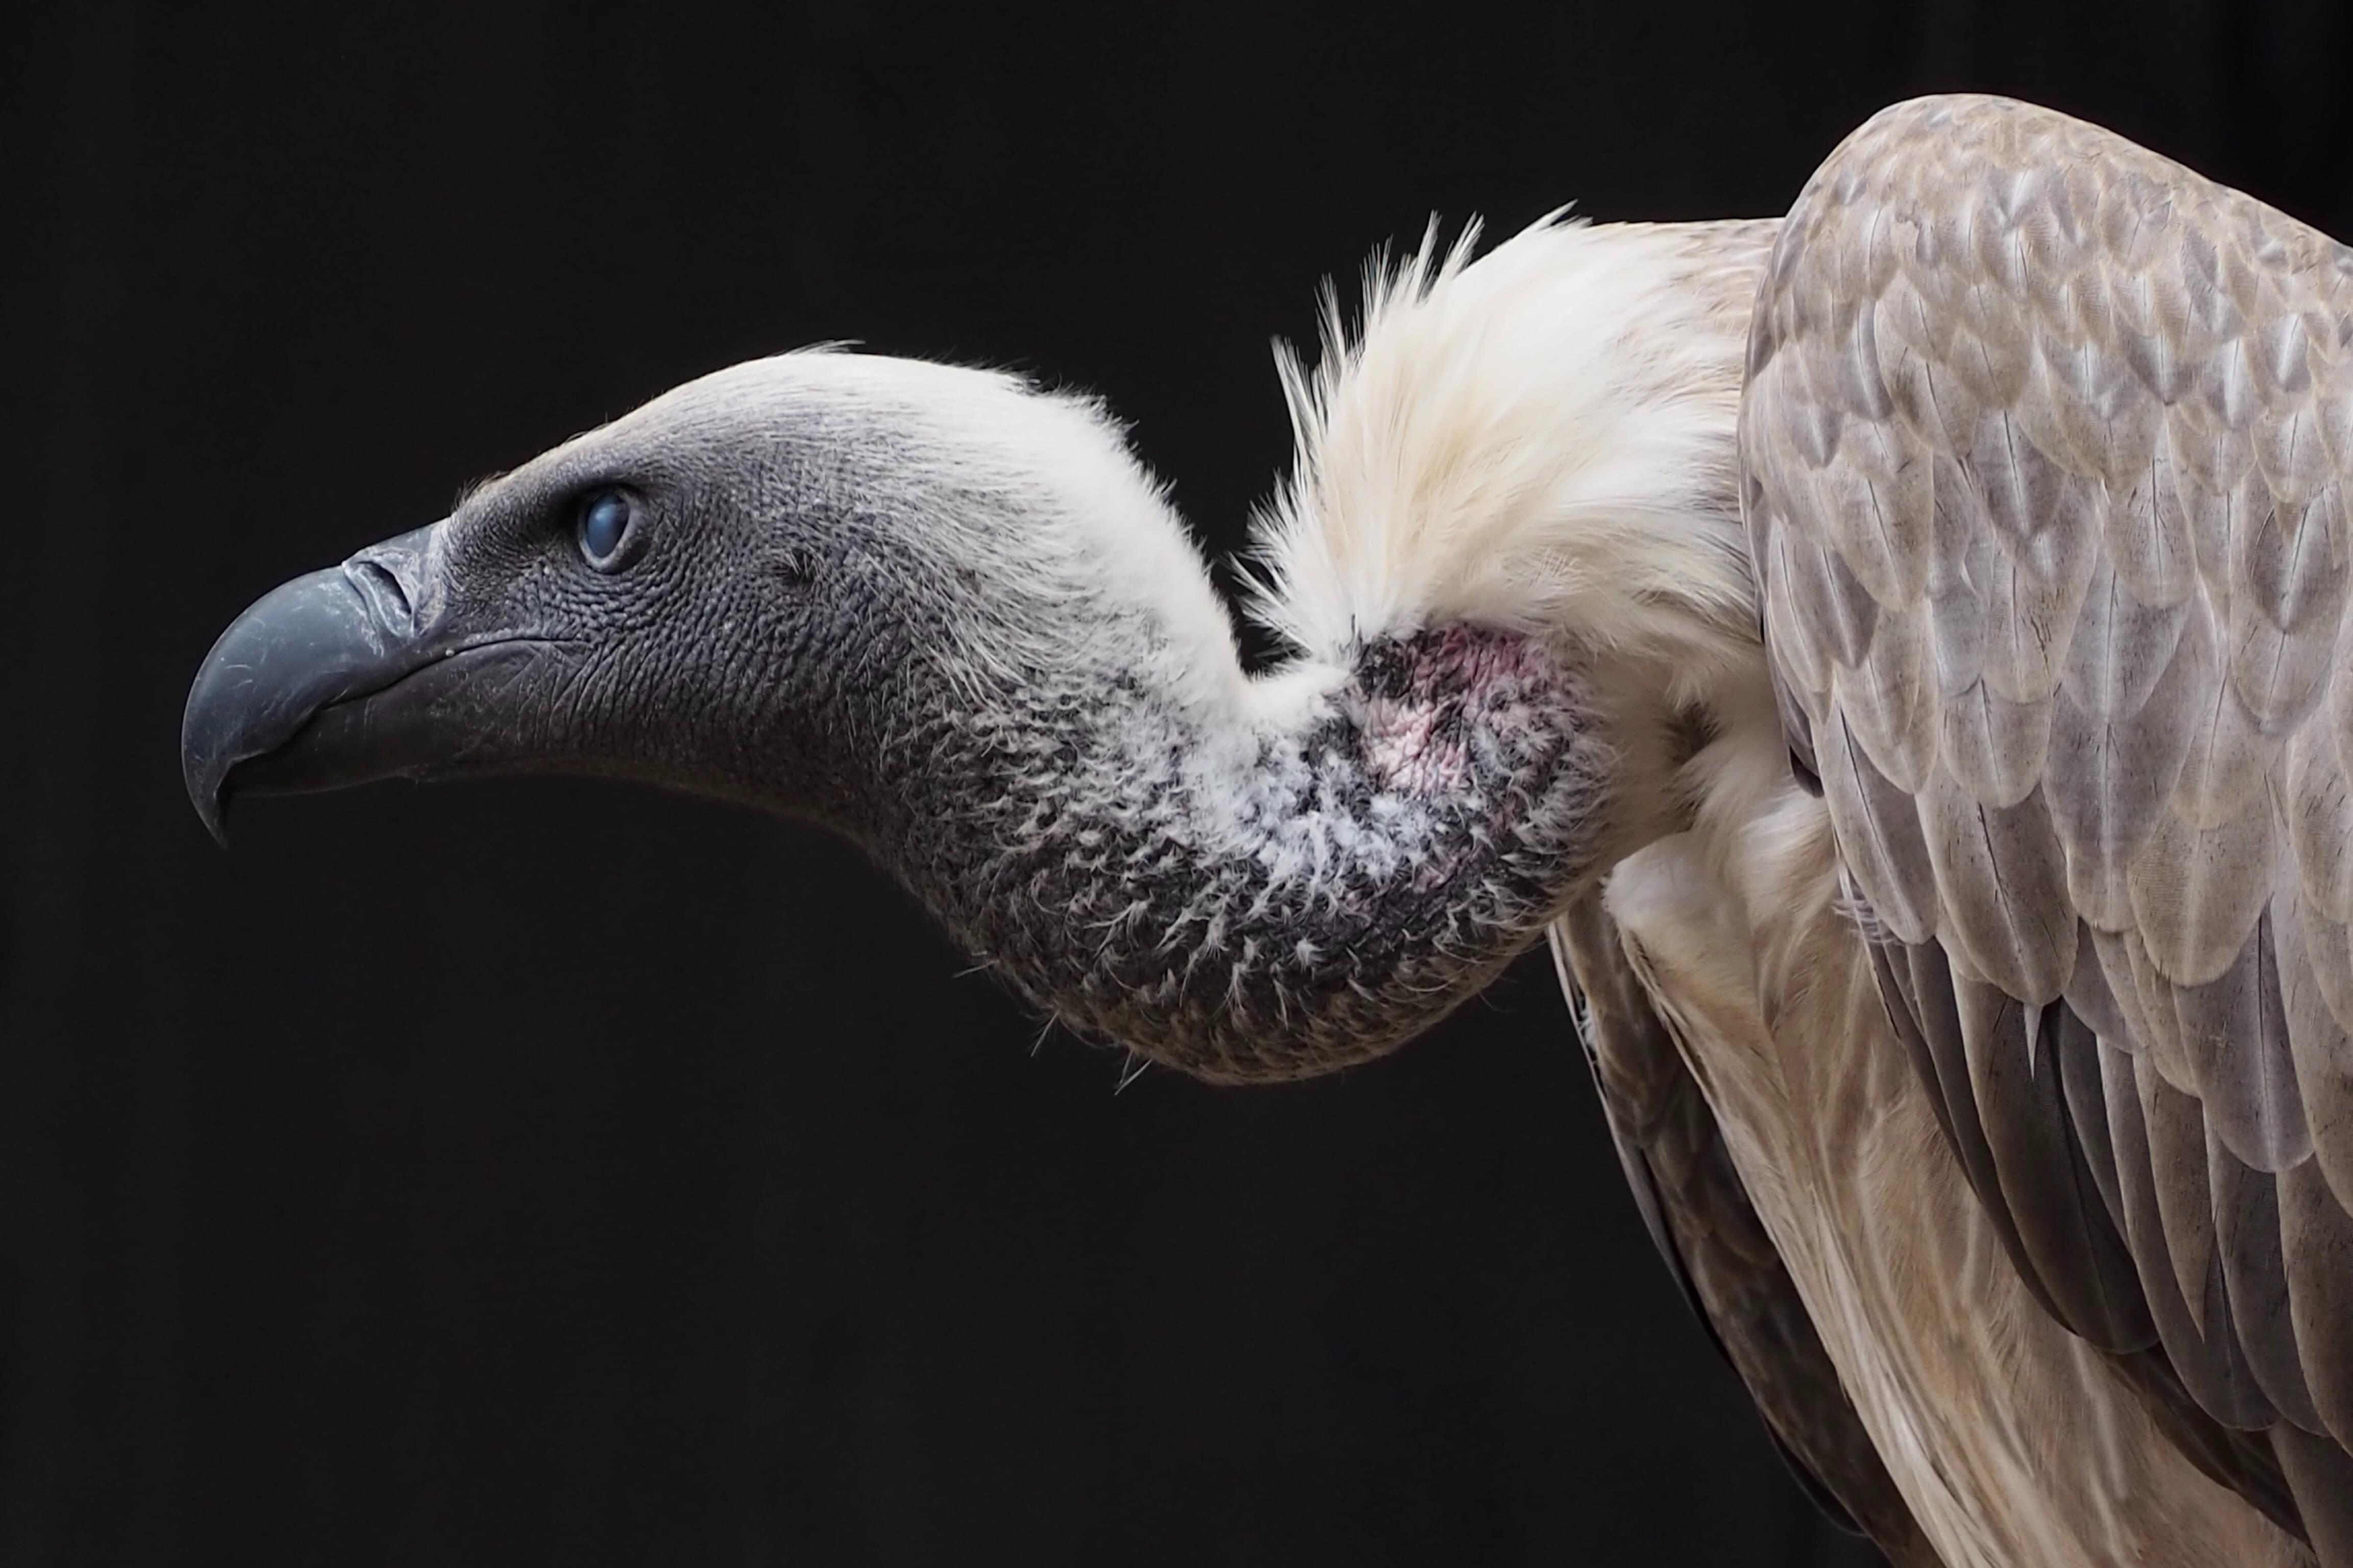 Vulture lands on paraglider mid-flight!